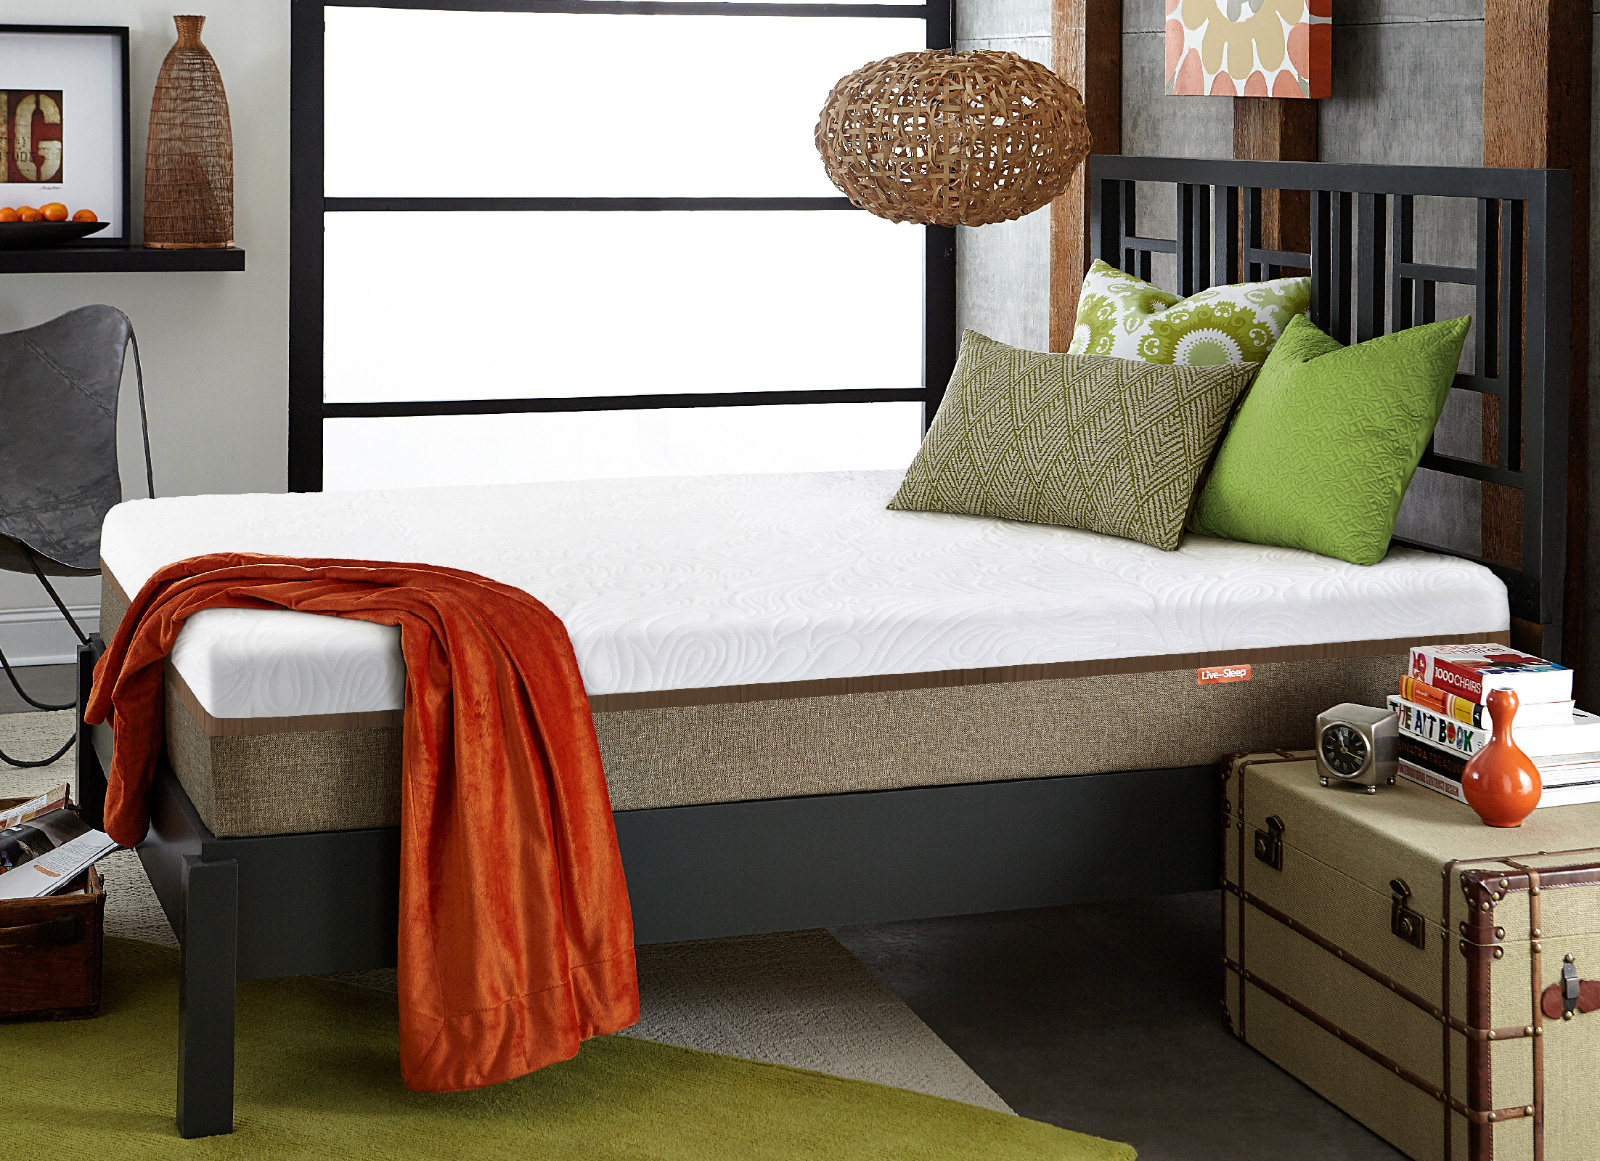 Buy Gel mattress online